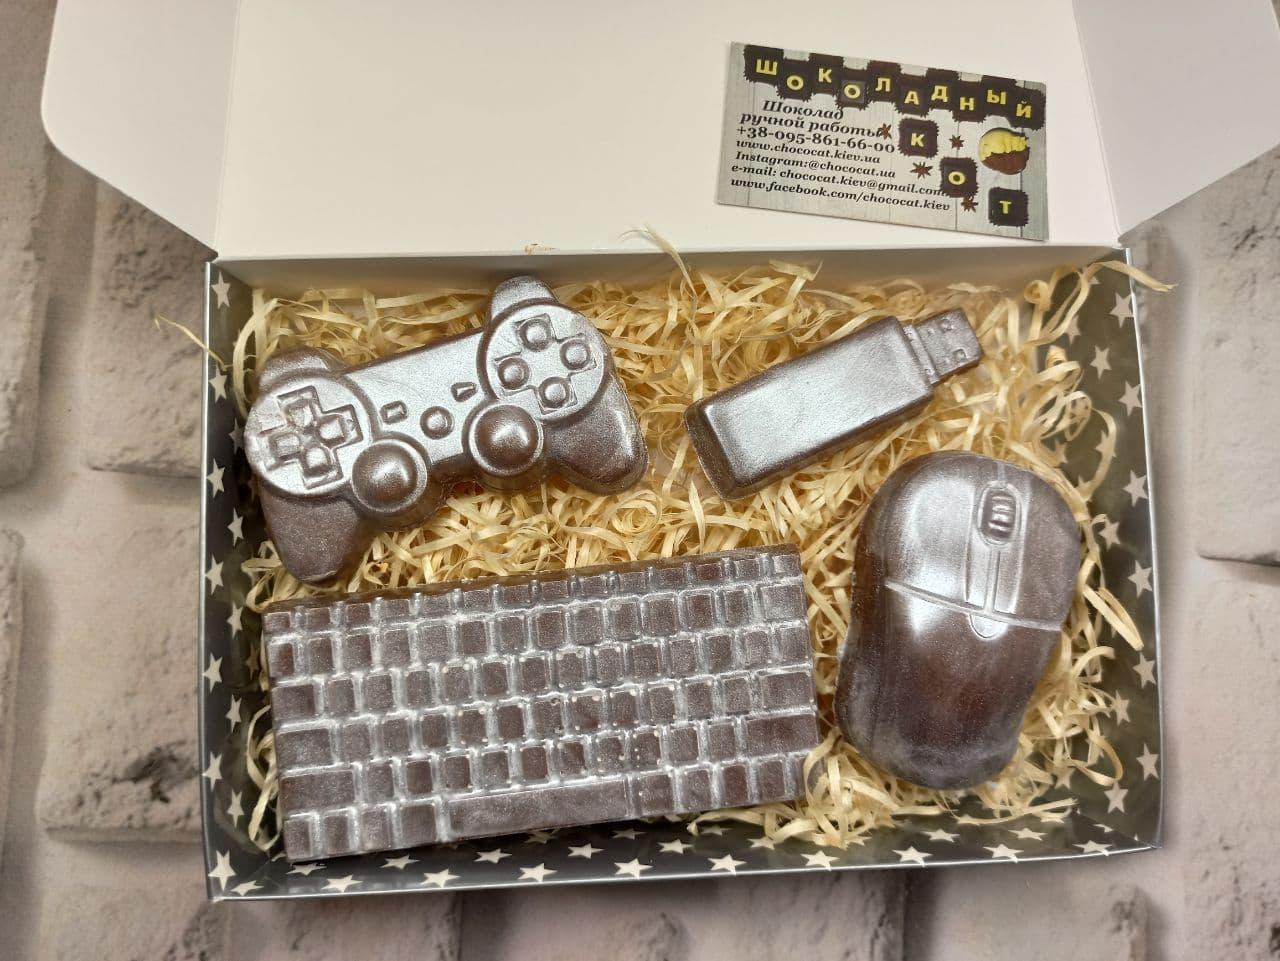 шоколадная клавиатура, мышь, флешка, геймпад